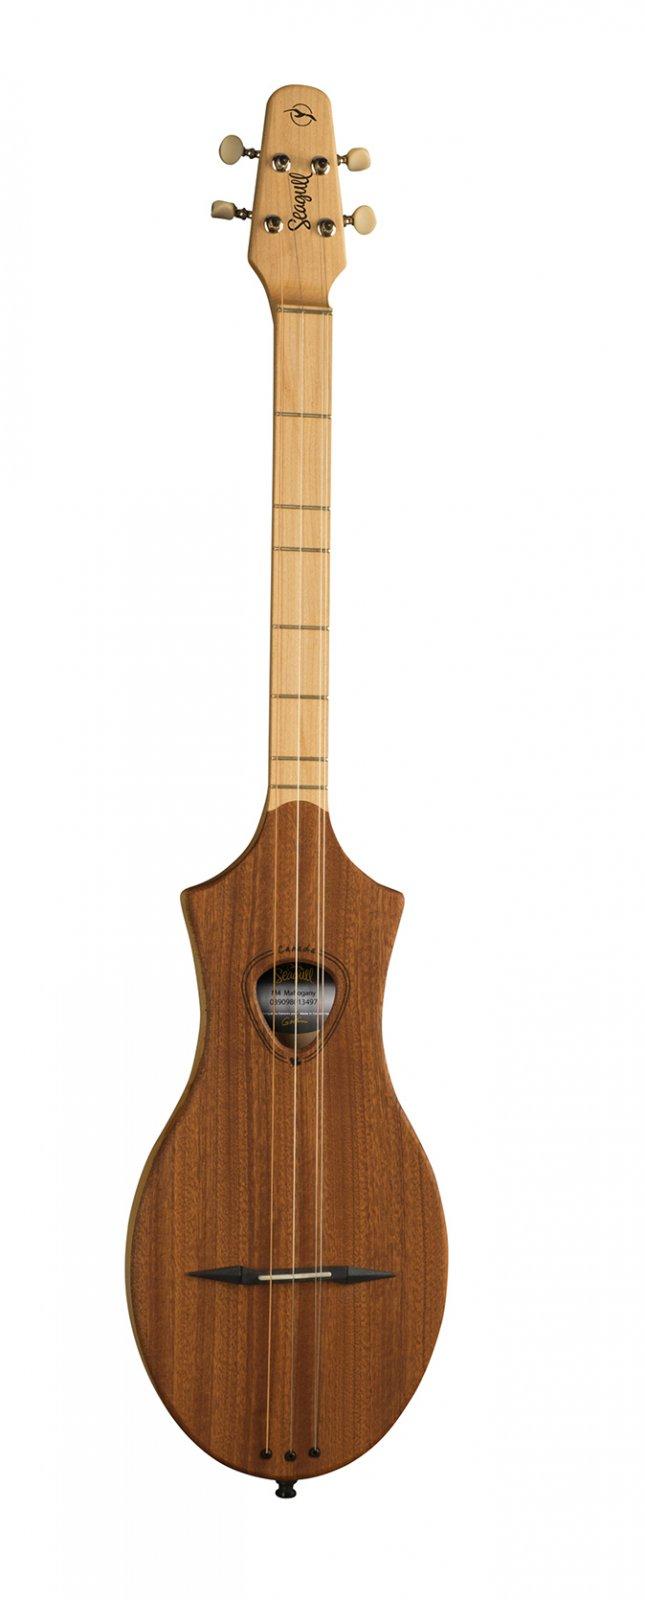 Seagull Merlin M4 D-Tuning SG Dulcimer Guitar-Mahogany